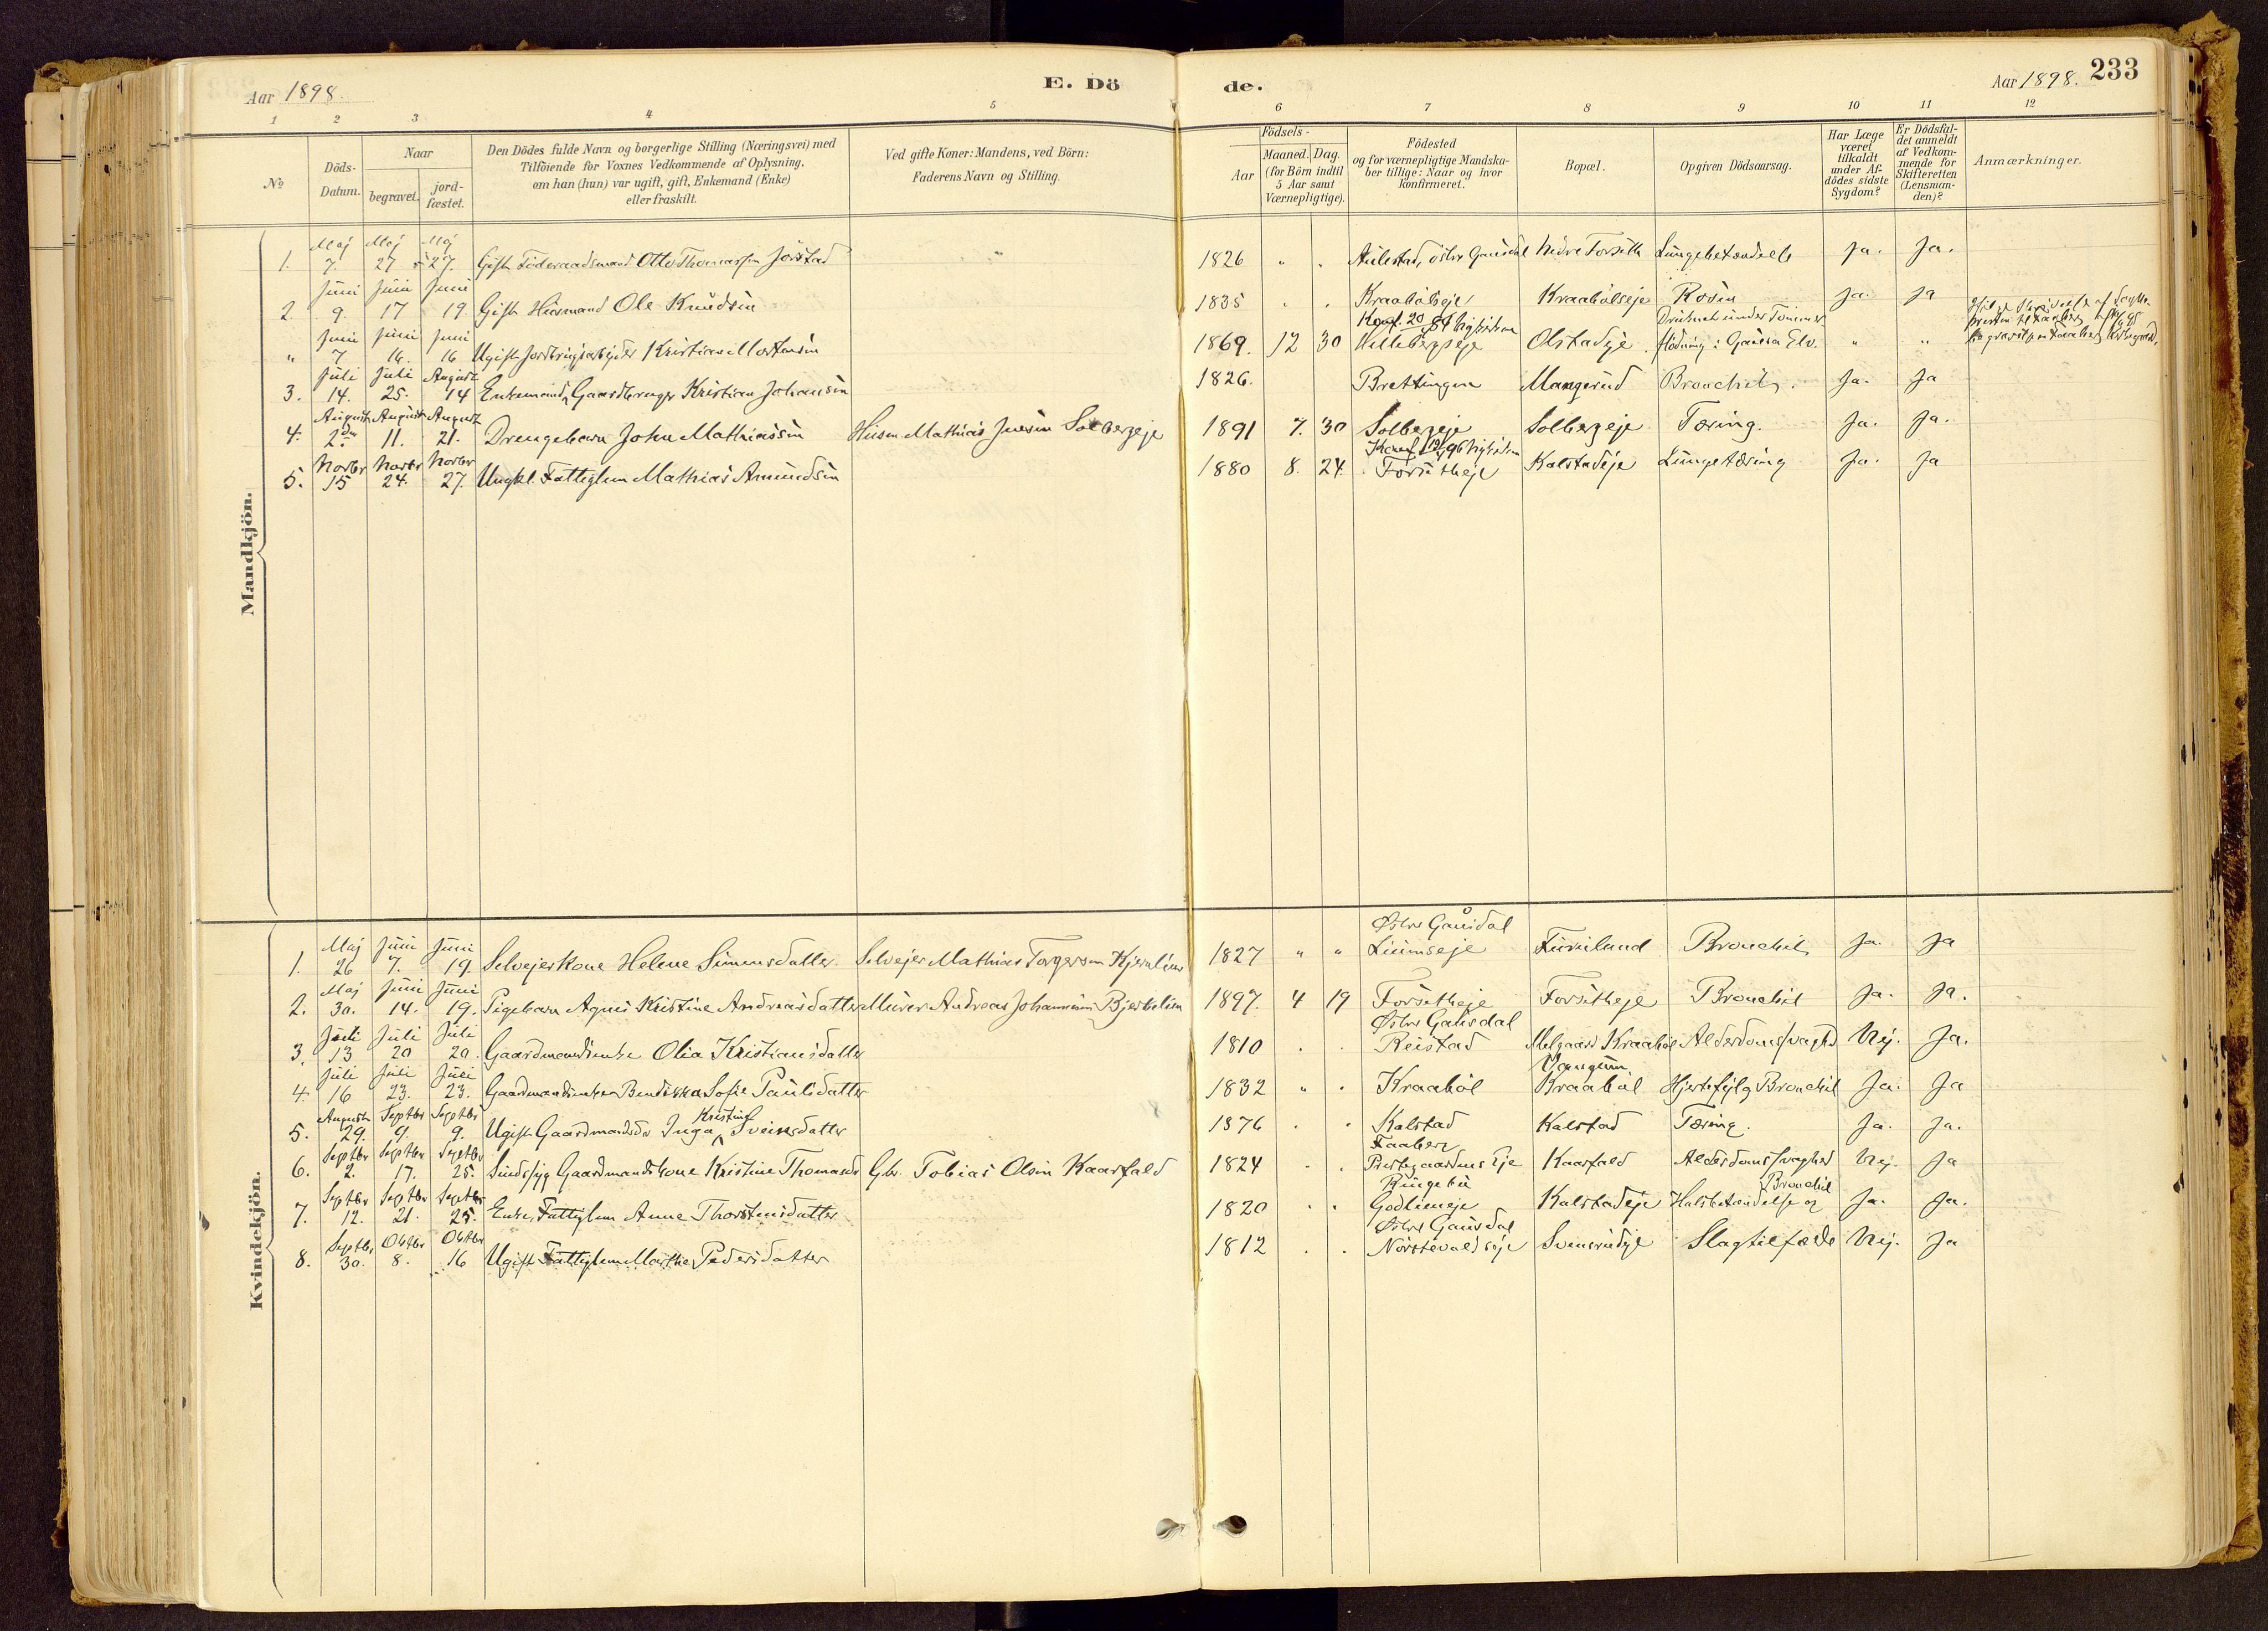 SAH, Vestre Gausdal prestekontor, Ministerialbok nr. 1, 1887-1914, s. 233